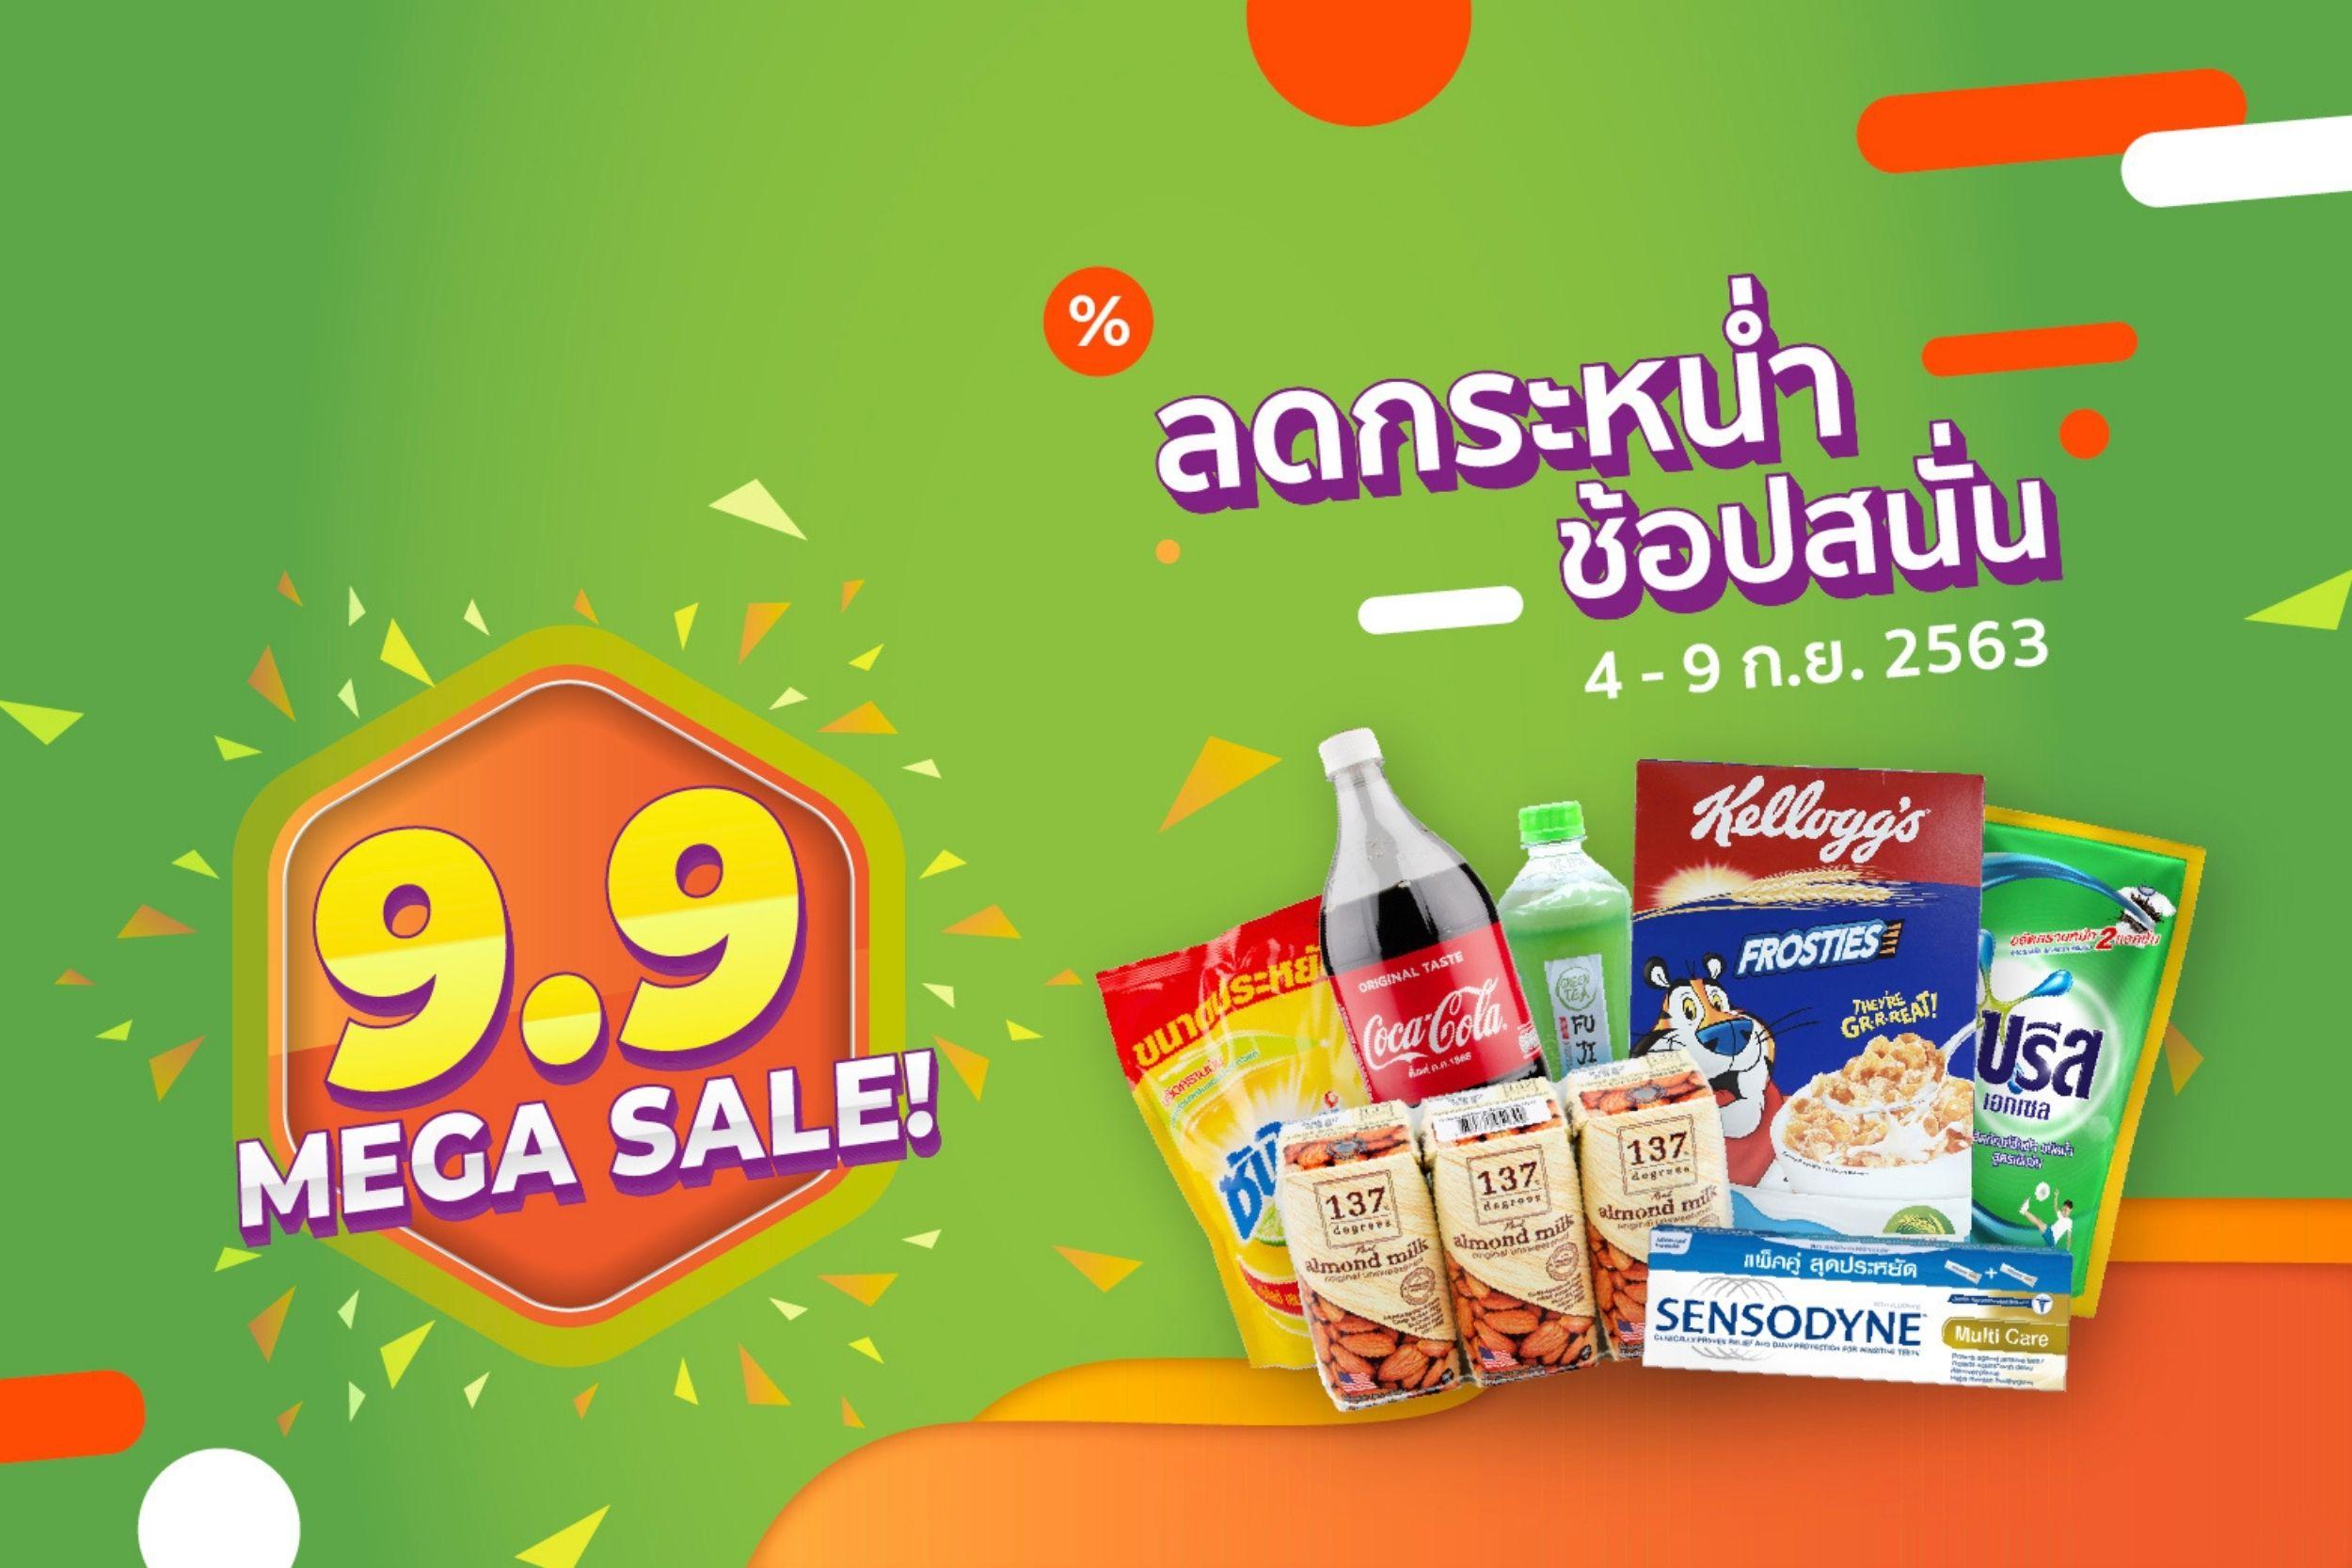 HappyFresh_Promotion_9_9_Mega_Sale_50_Percent